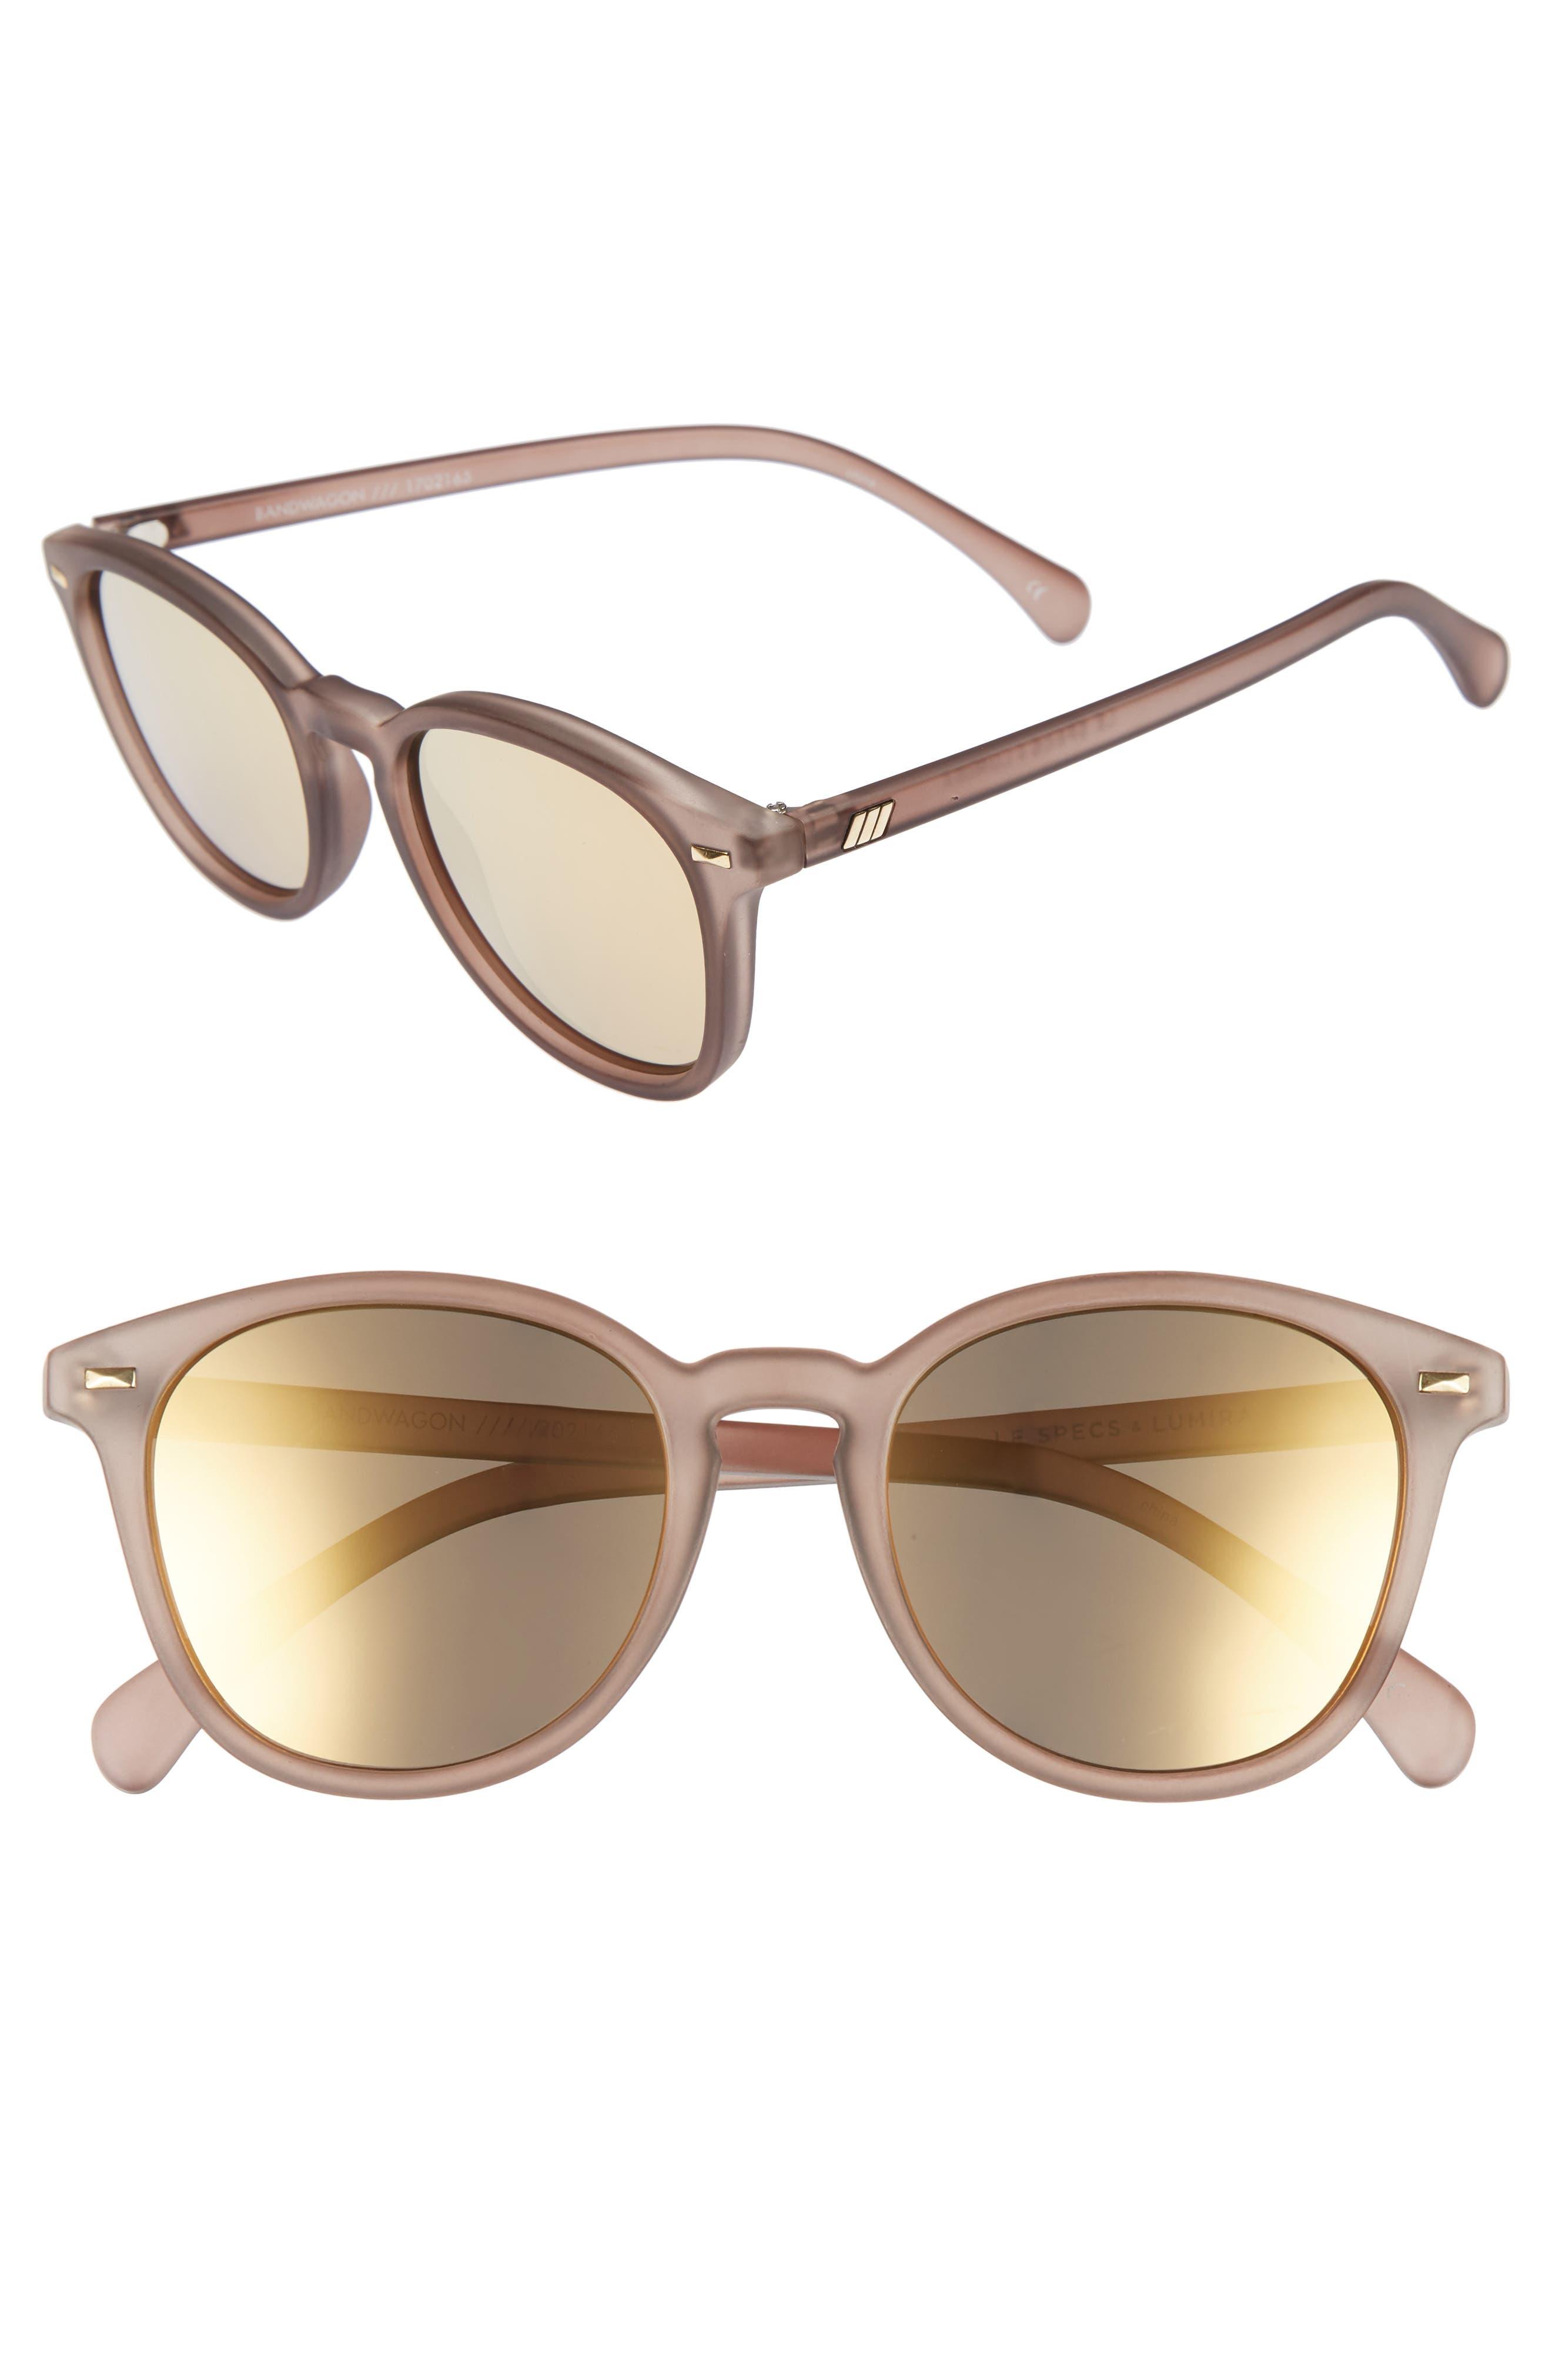 x Lumira Bandwagon 51mm Sunglasses & Candle Gift Set,                         Main,                         color, 020